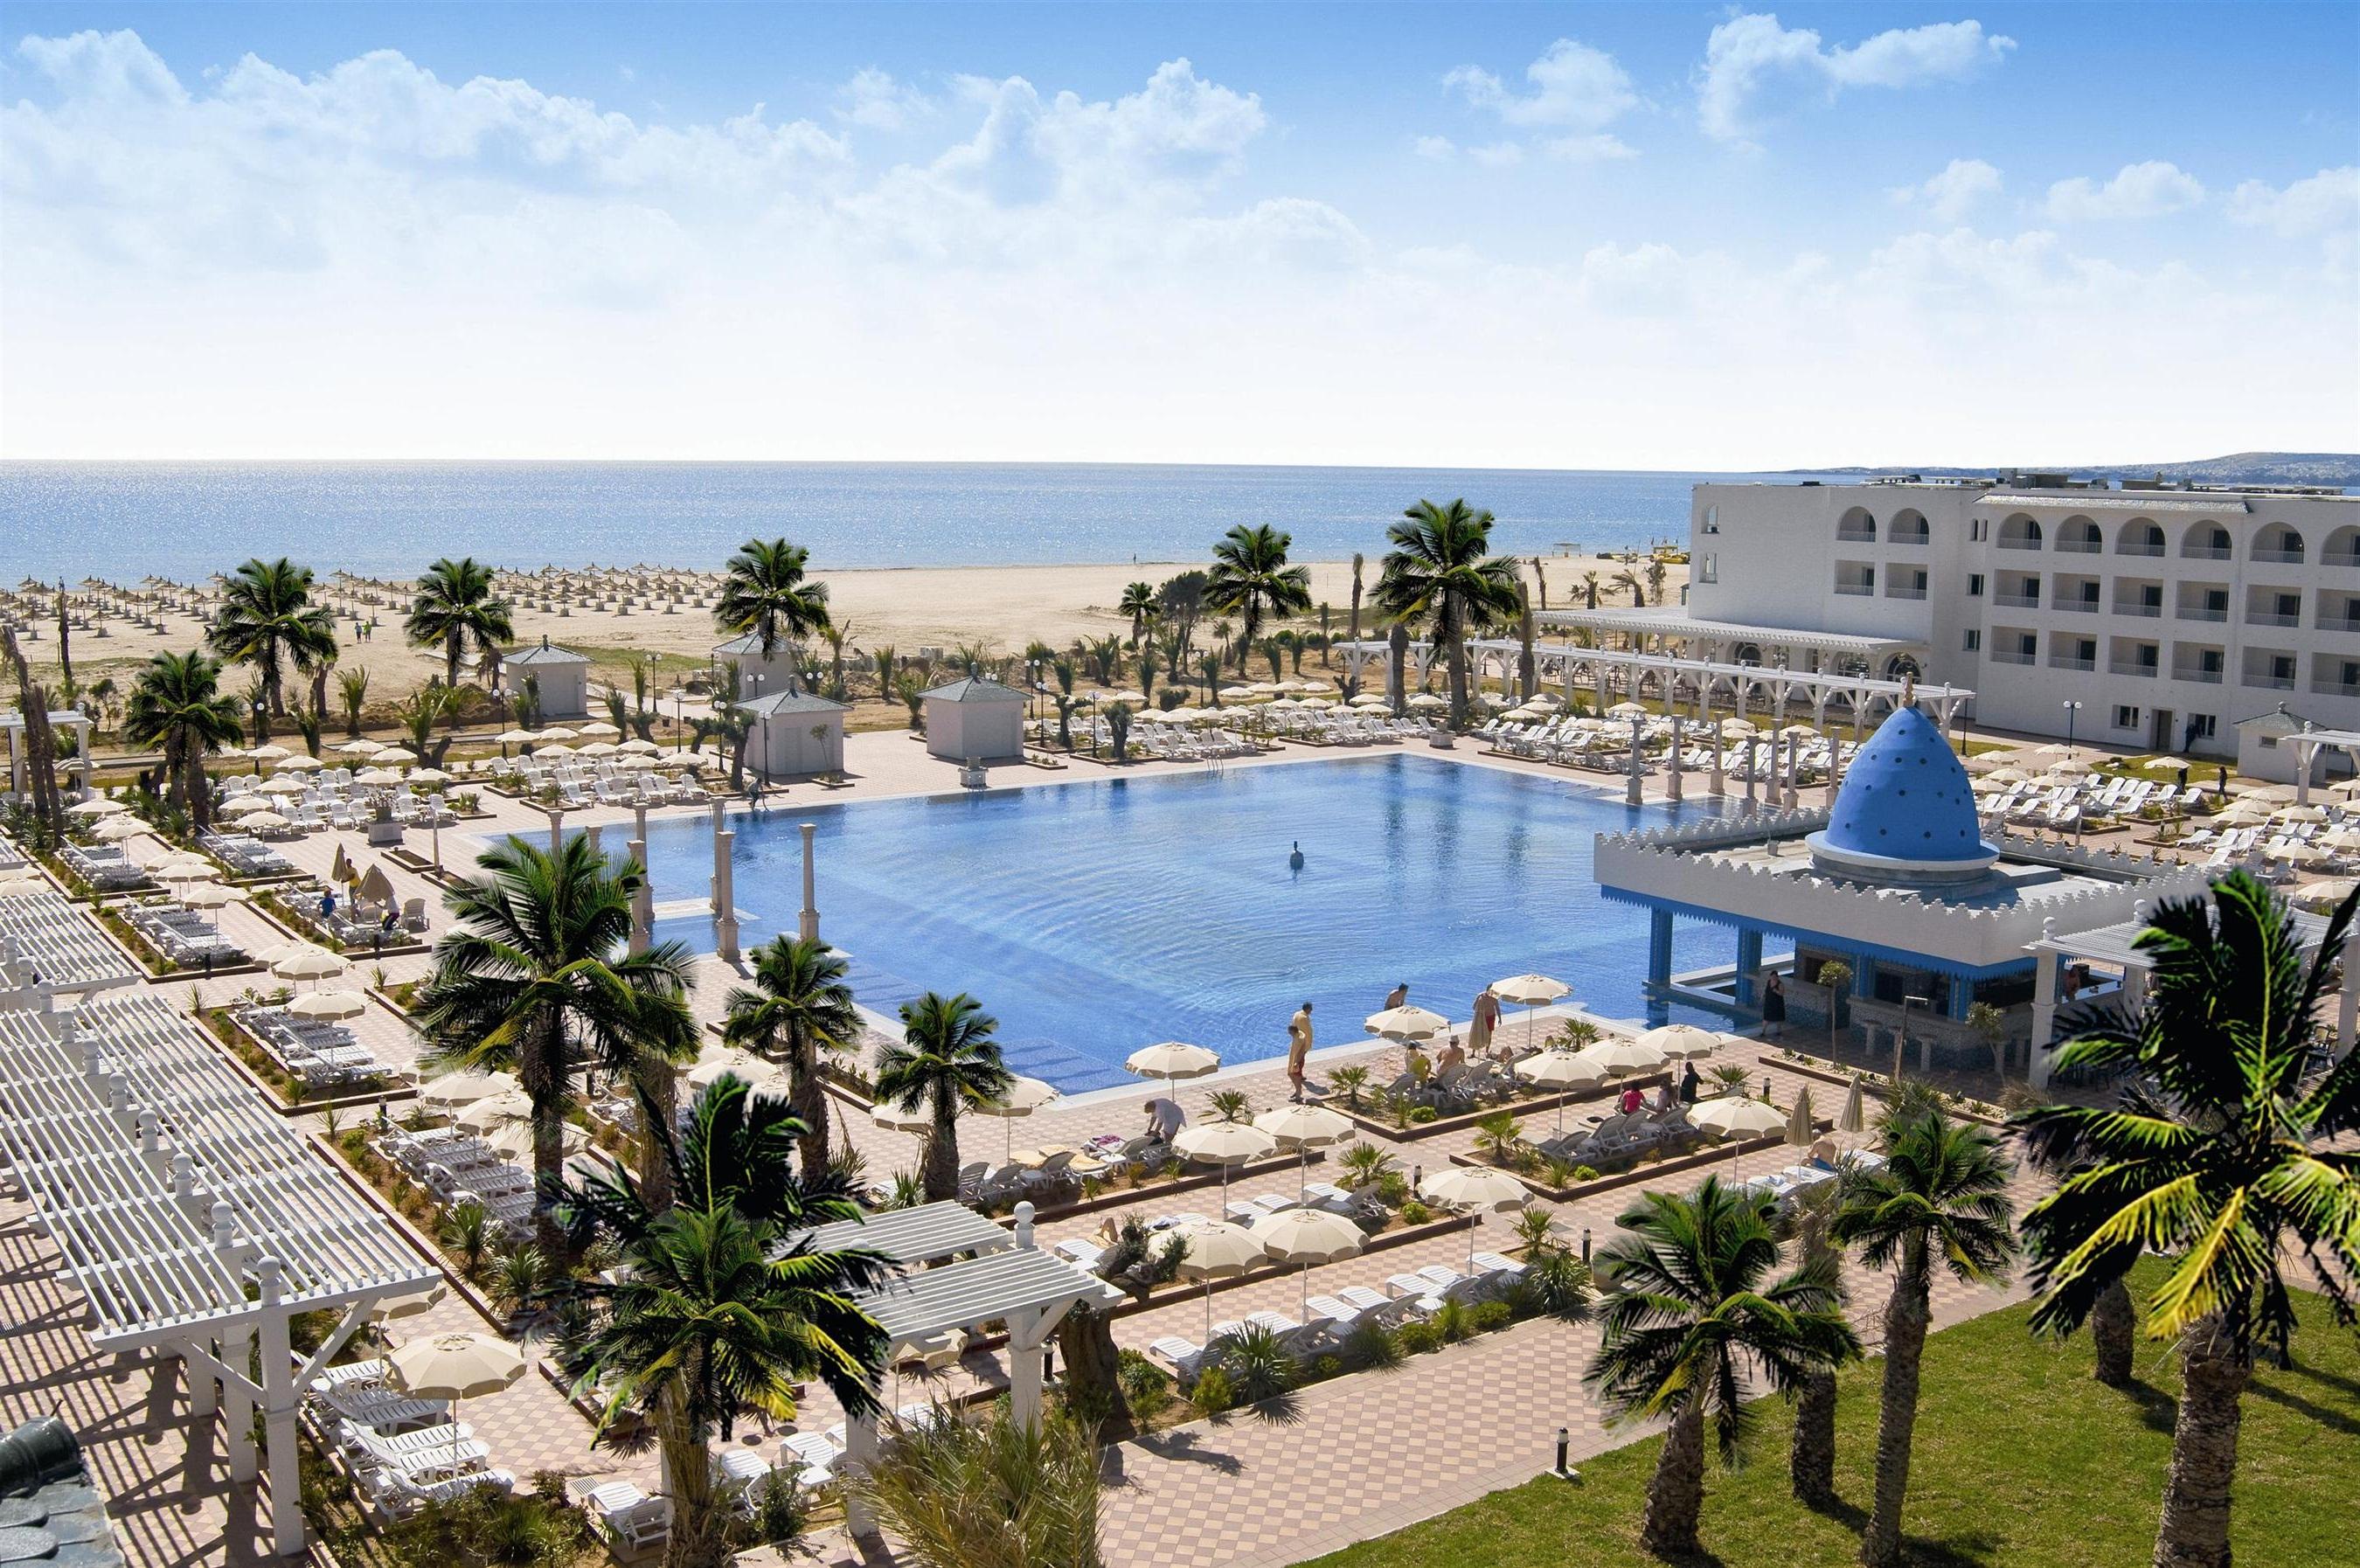 agence-voyage-tunisie-voyages20130617045251